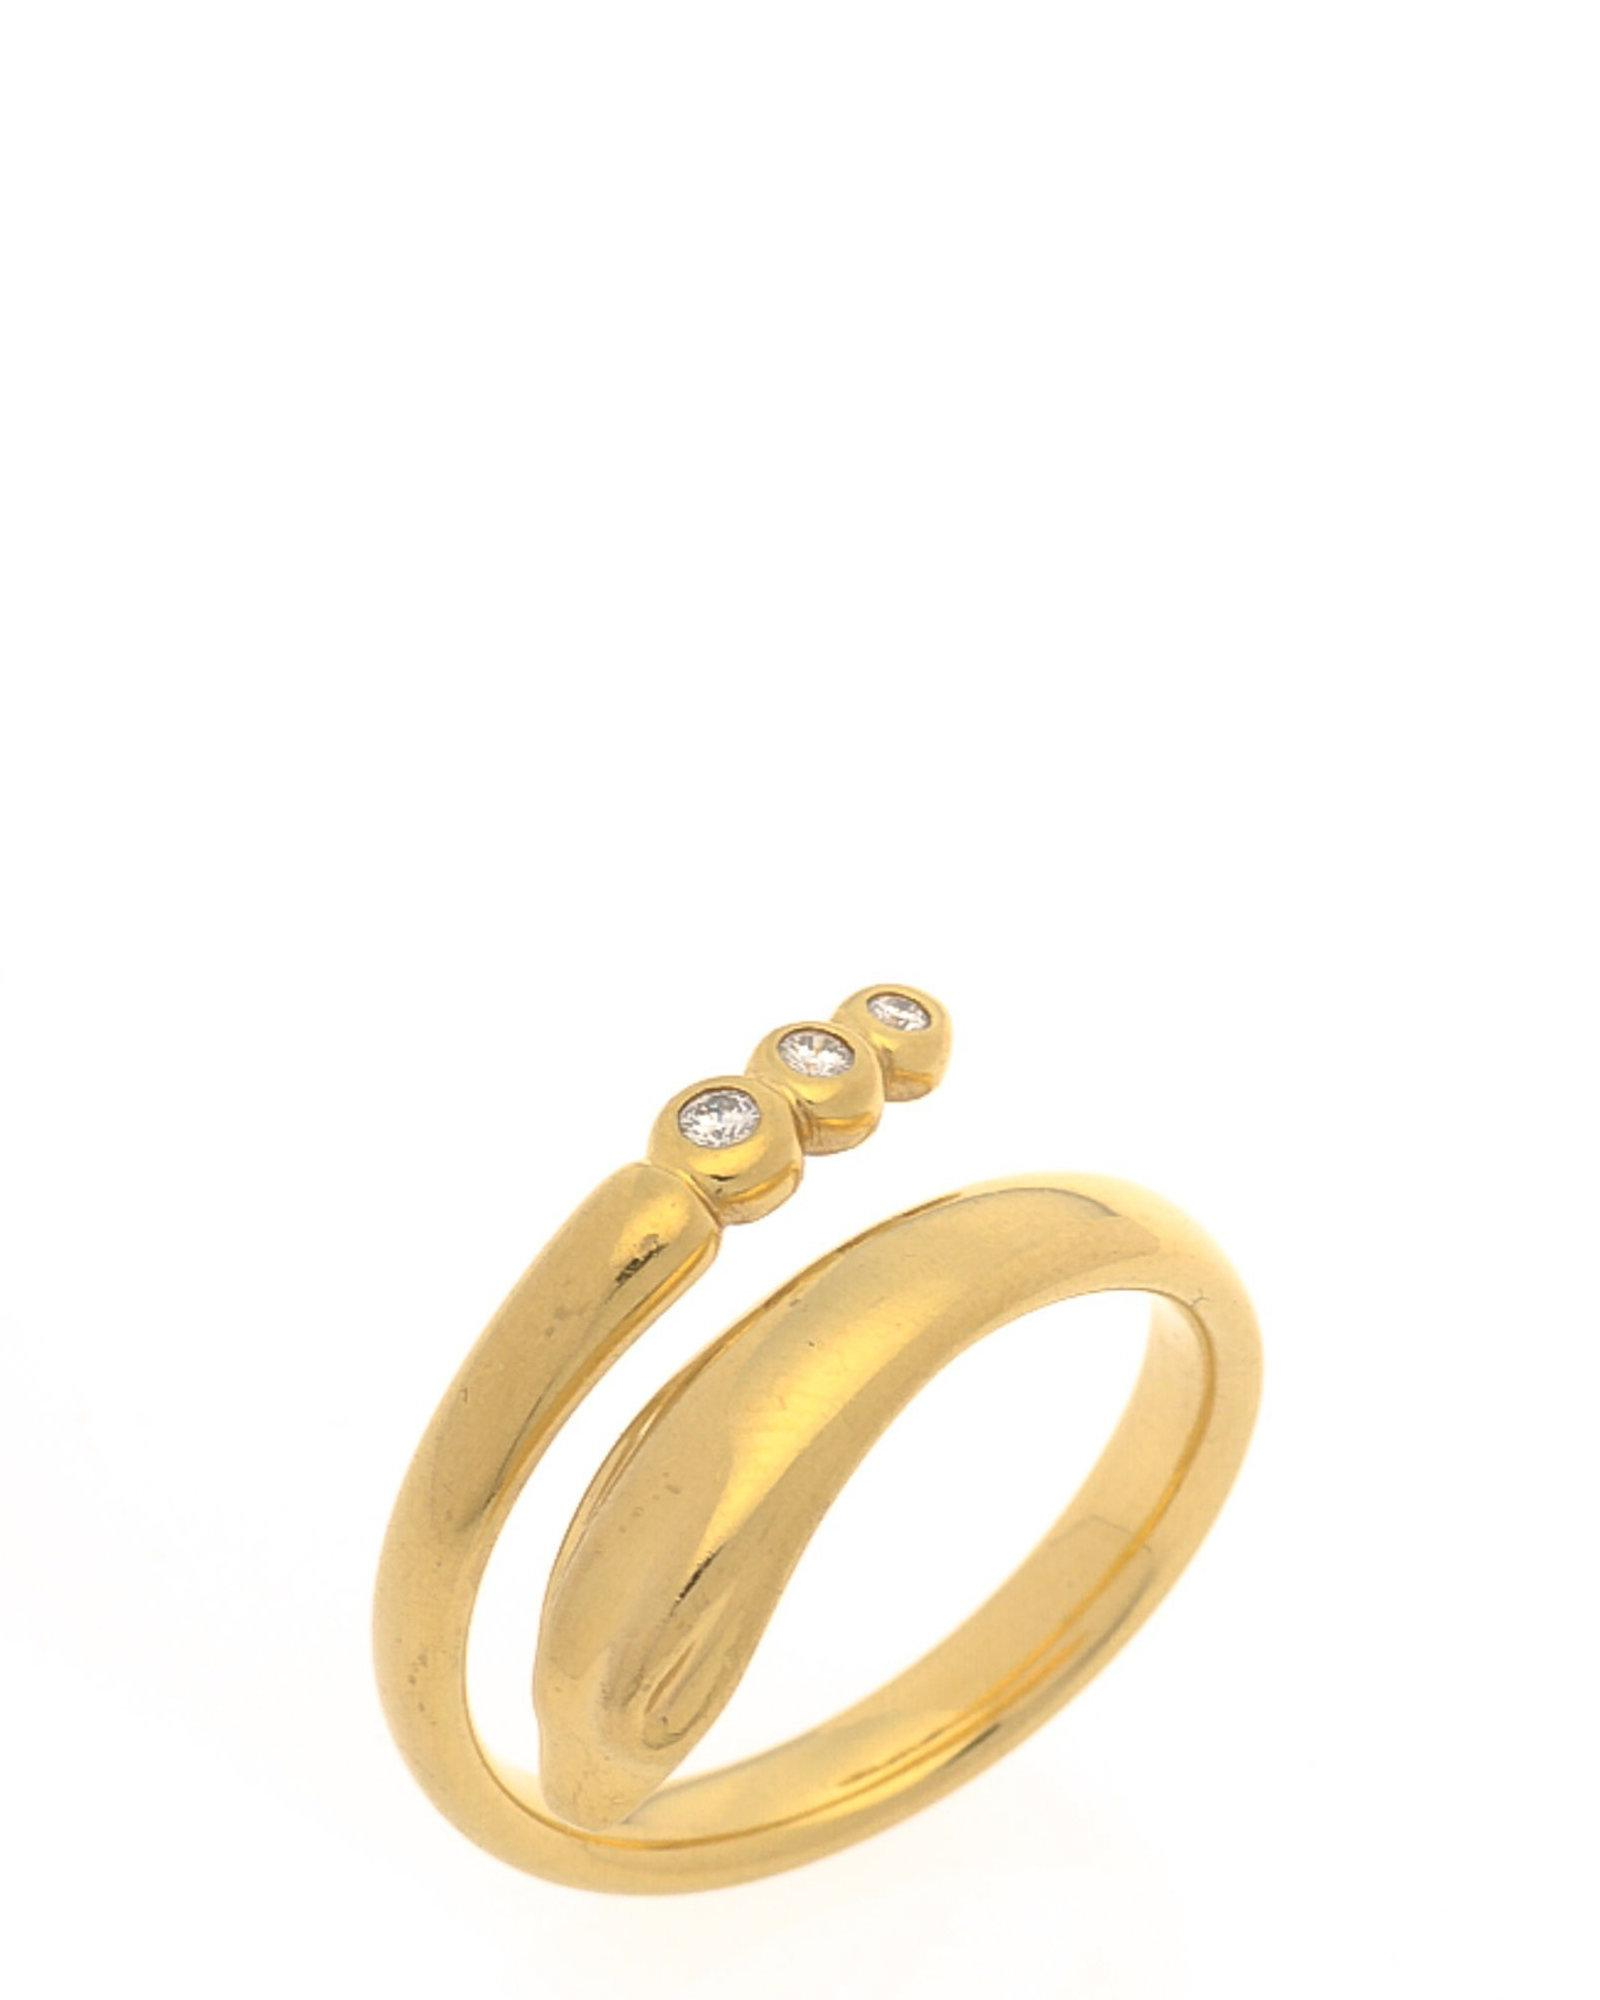 9c8f5edeb Tiffany & Co. Elsa Peretti Snake Ring - Vintage in Metallic - Lyst